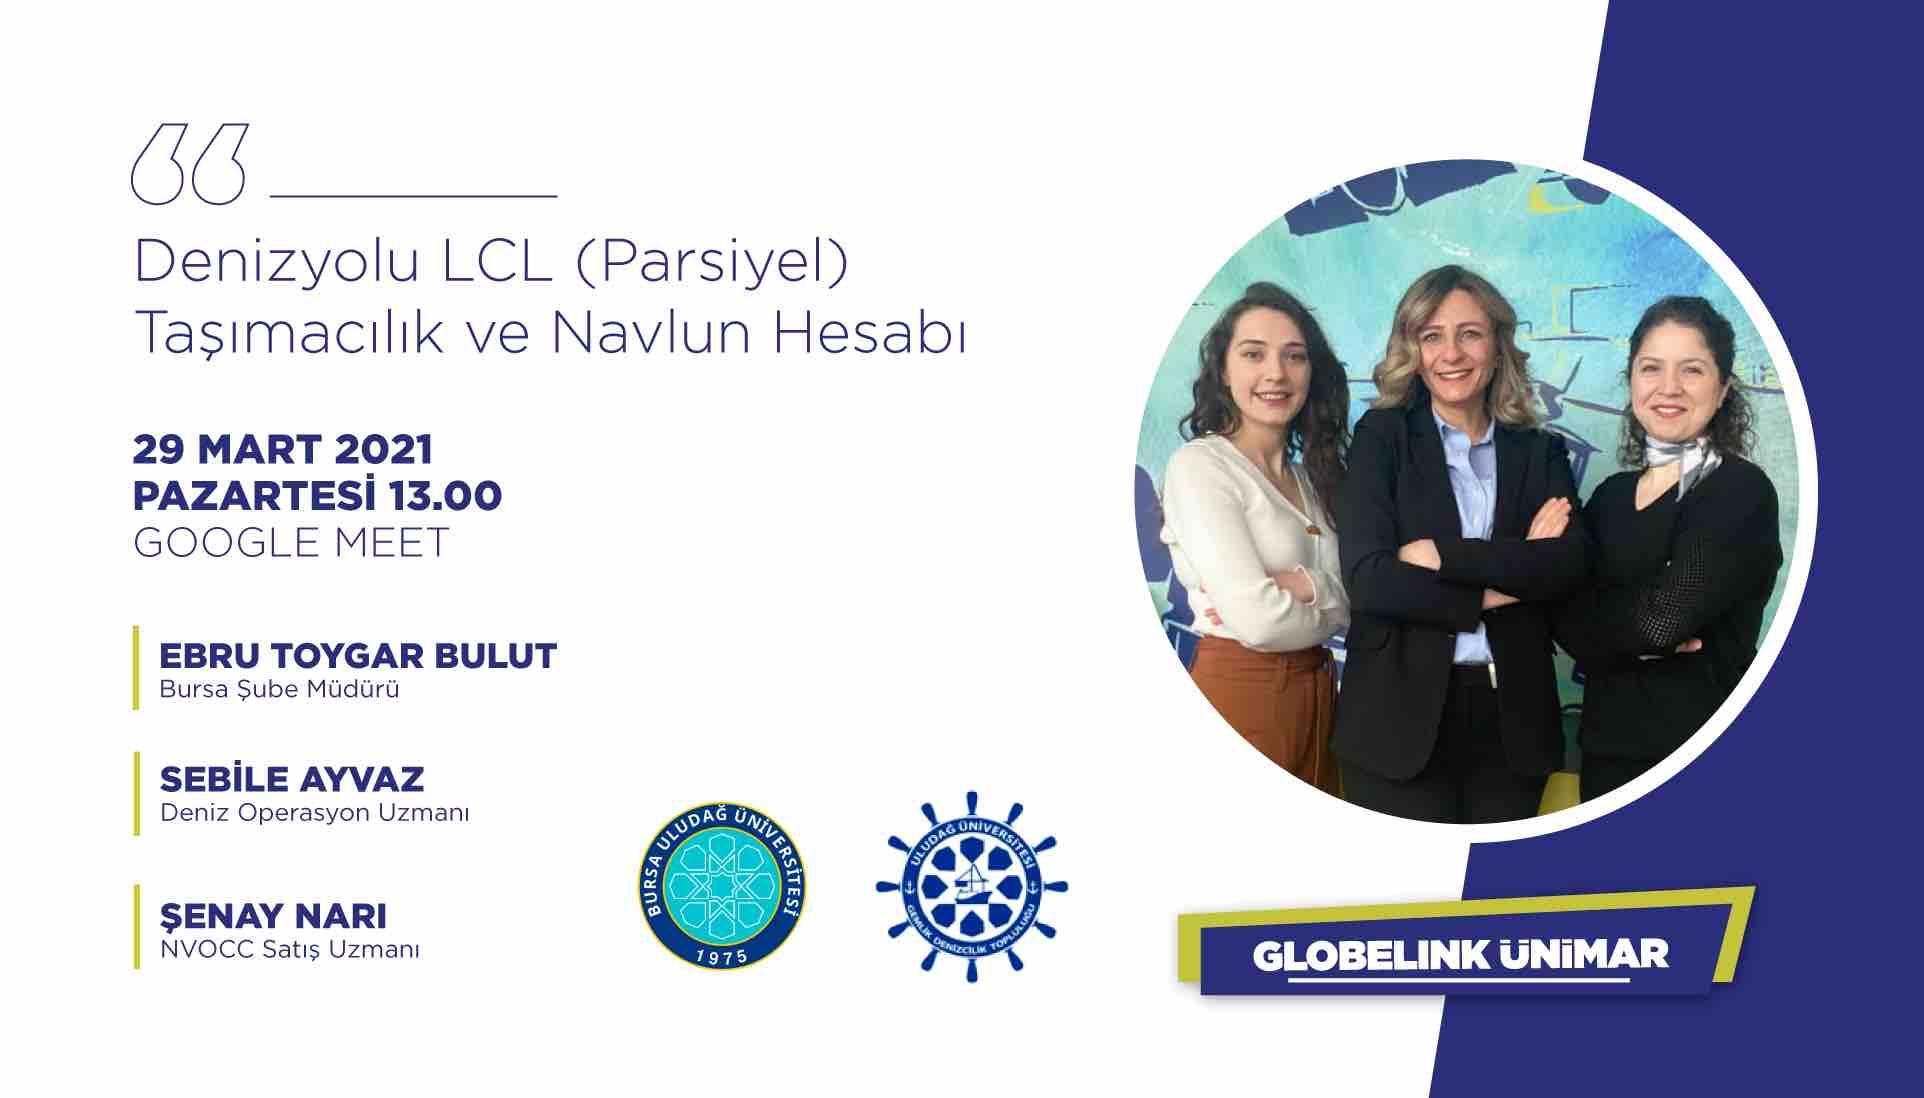 Globelink Ünimar Has Met with the Students of Uludağ University